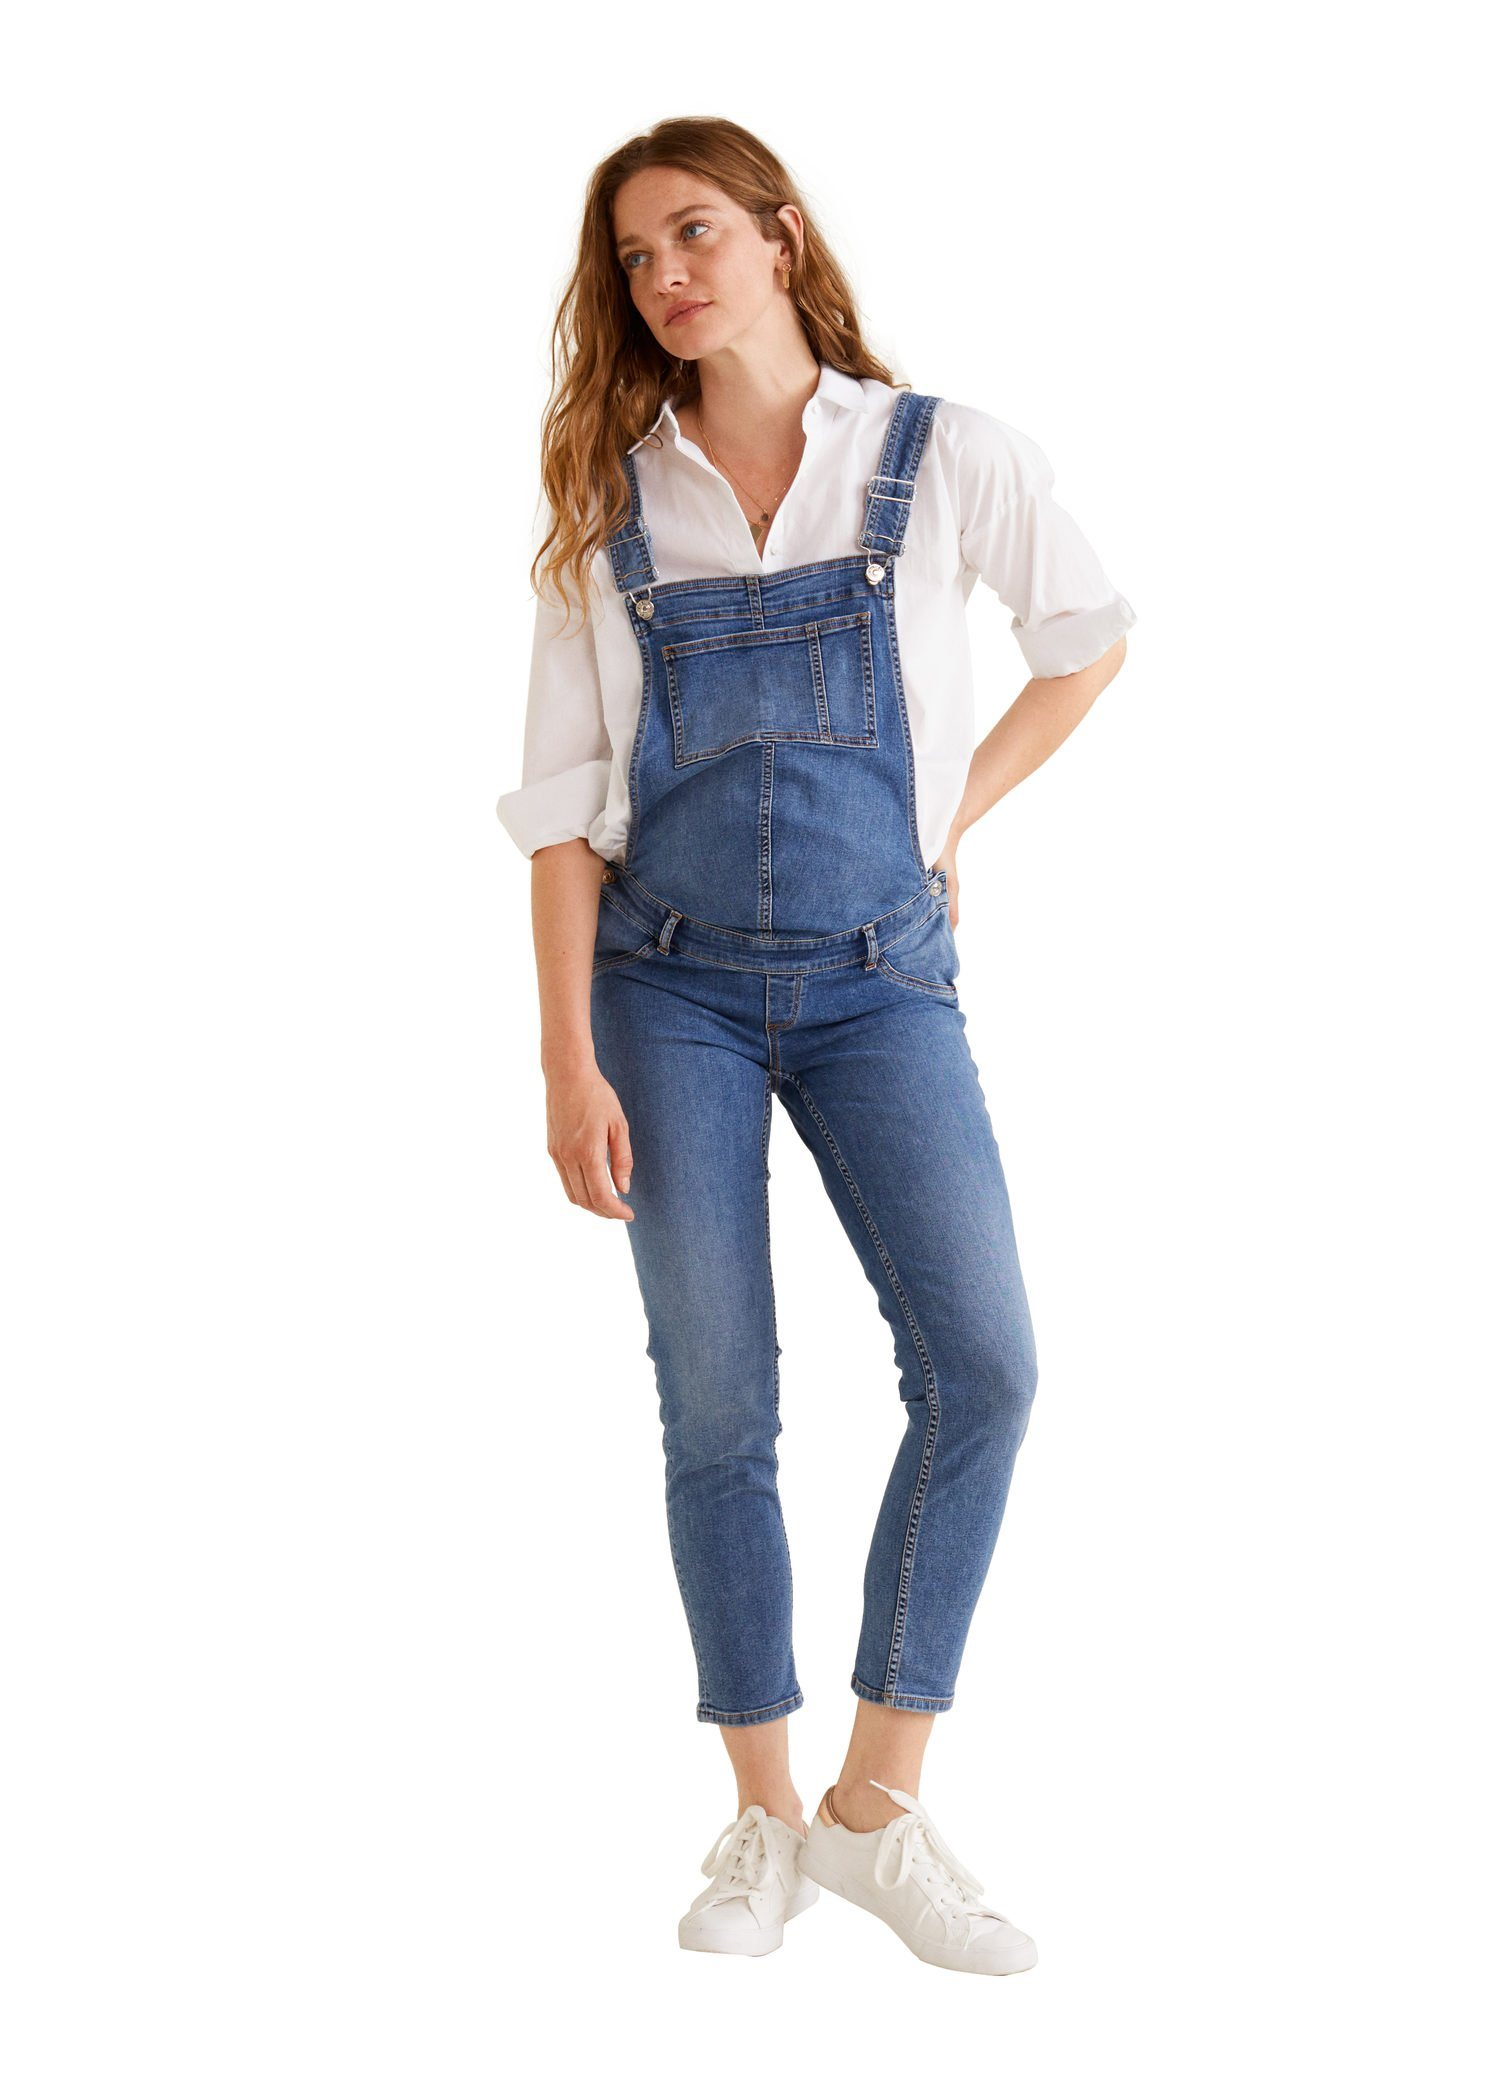 mango -  Jeans-Latzhose mit Kontrastnähten